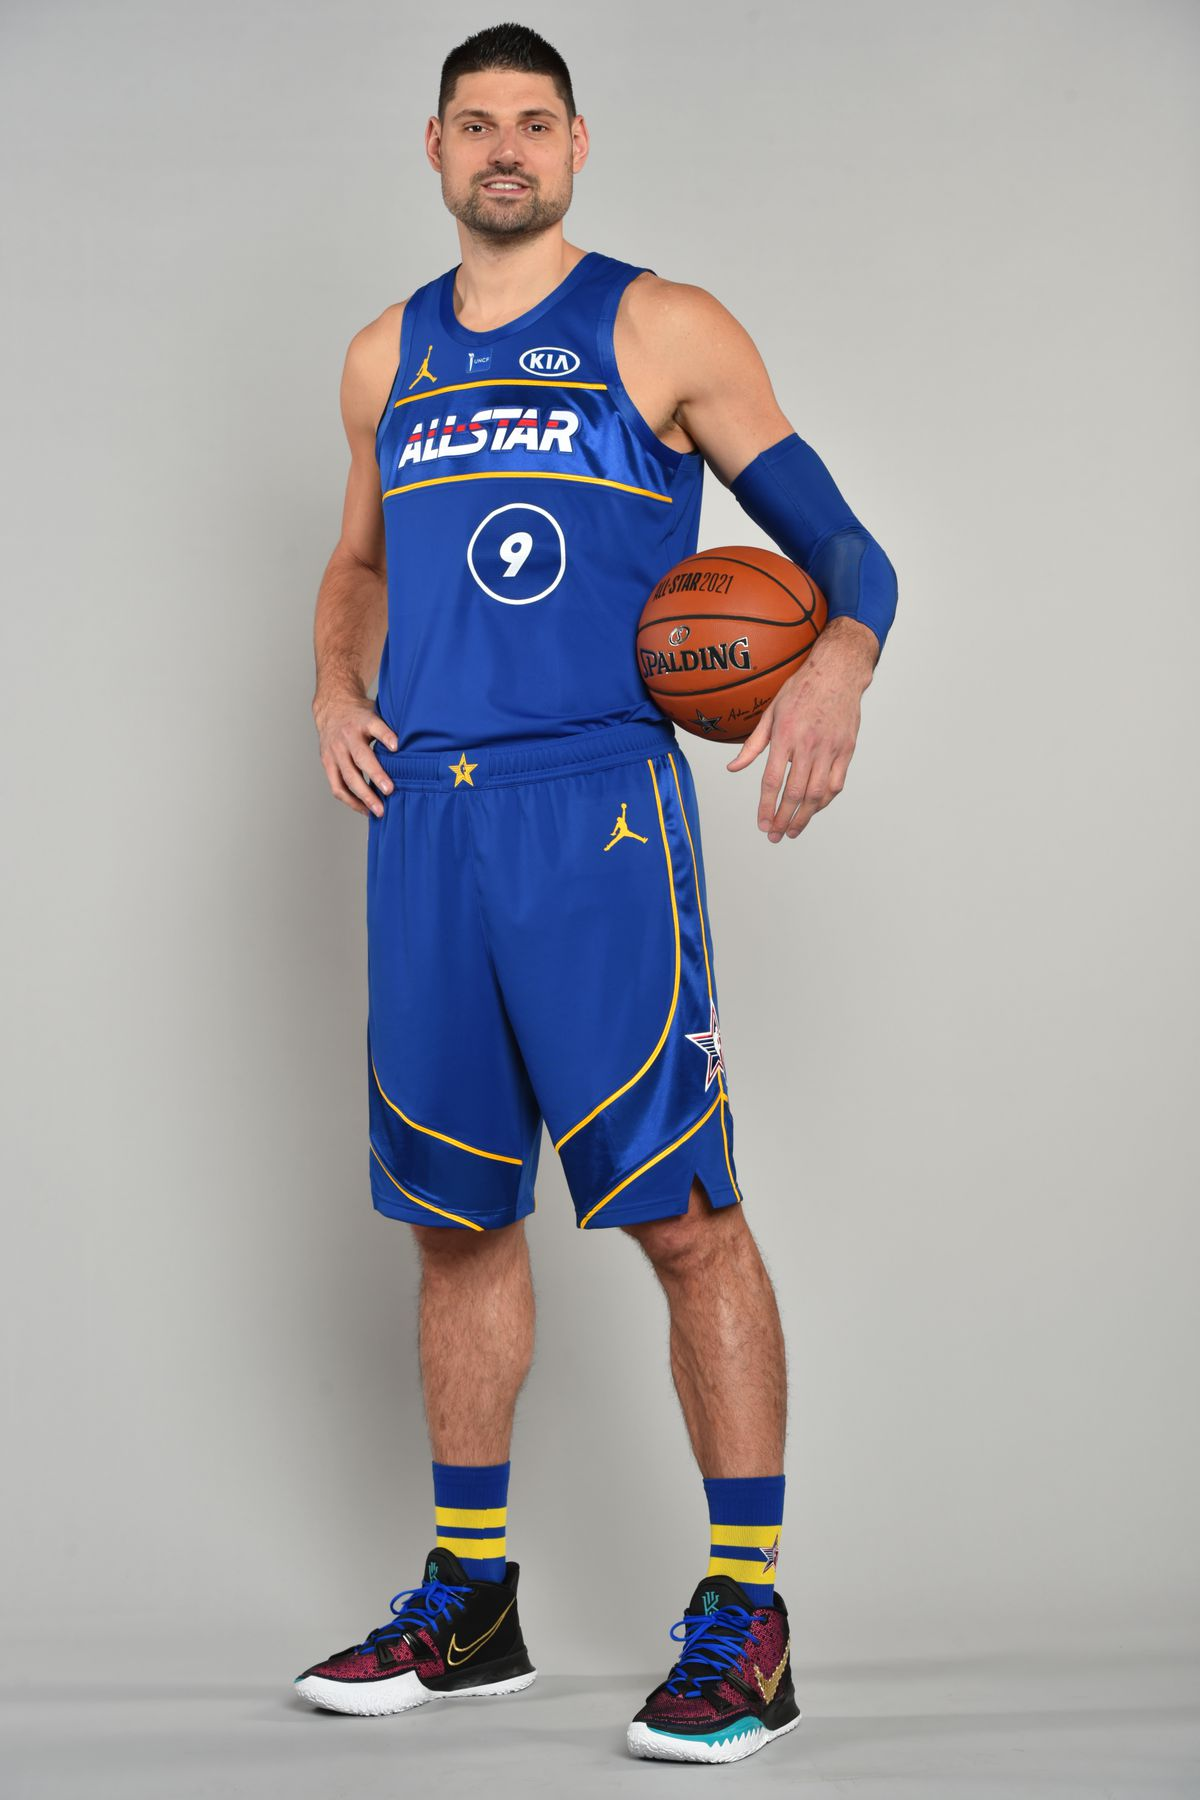 2021 NBA All-Star - Portraits